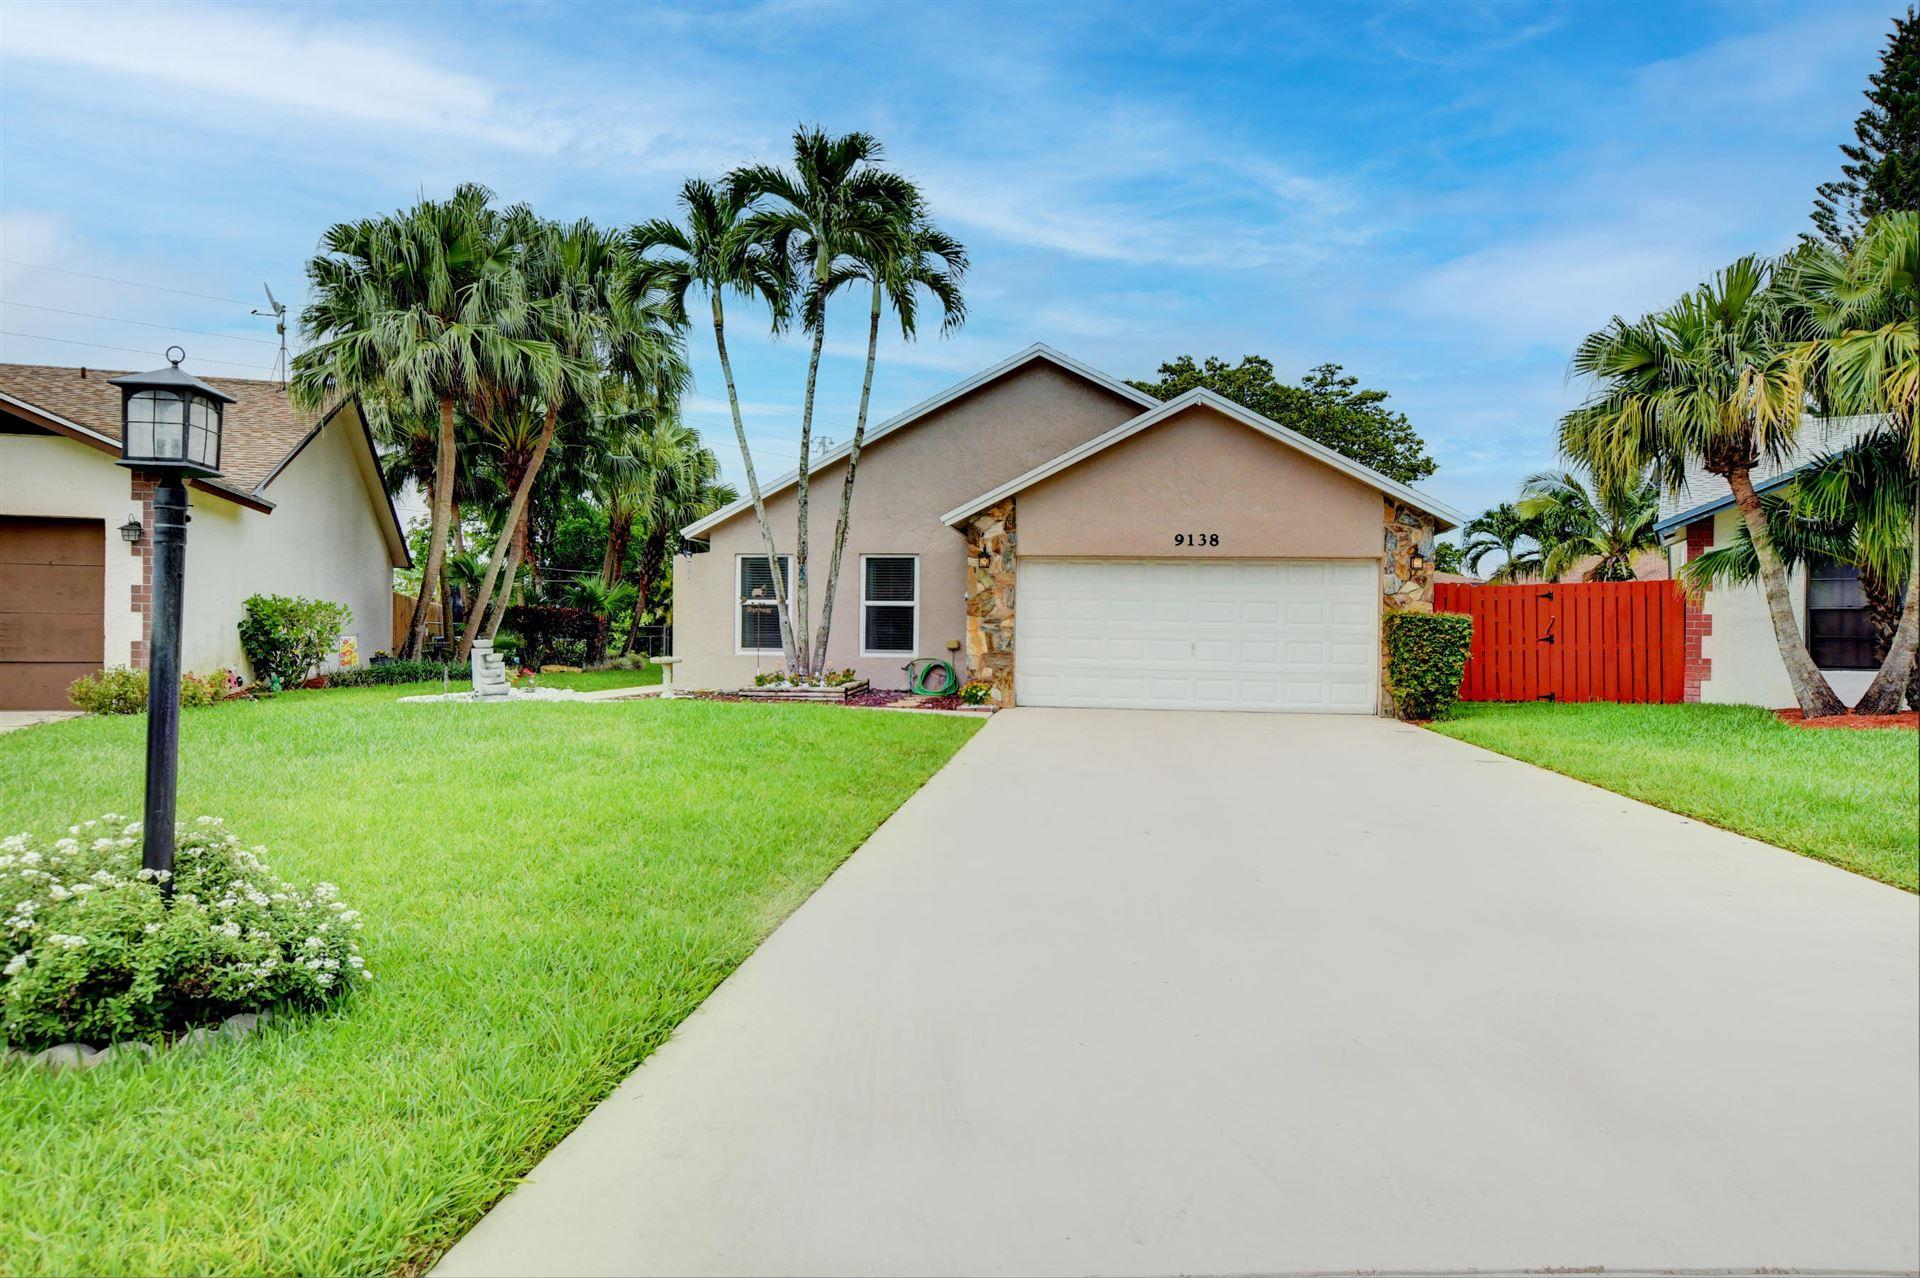 Photo of 9138 Chatsworth Cascades, Boca Raton, FL 33434 (MLS # RX-10726468)